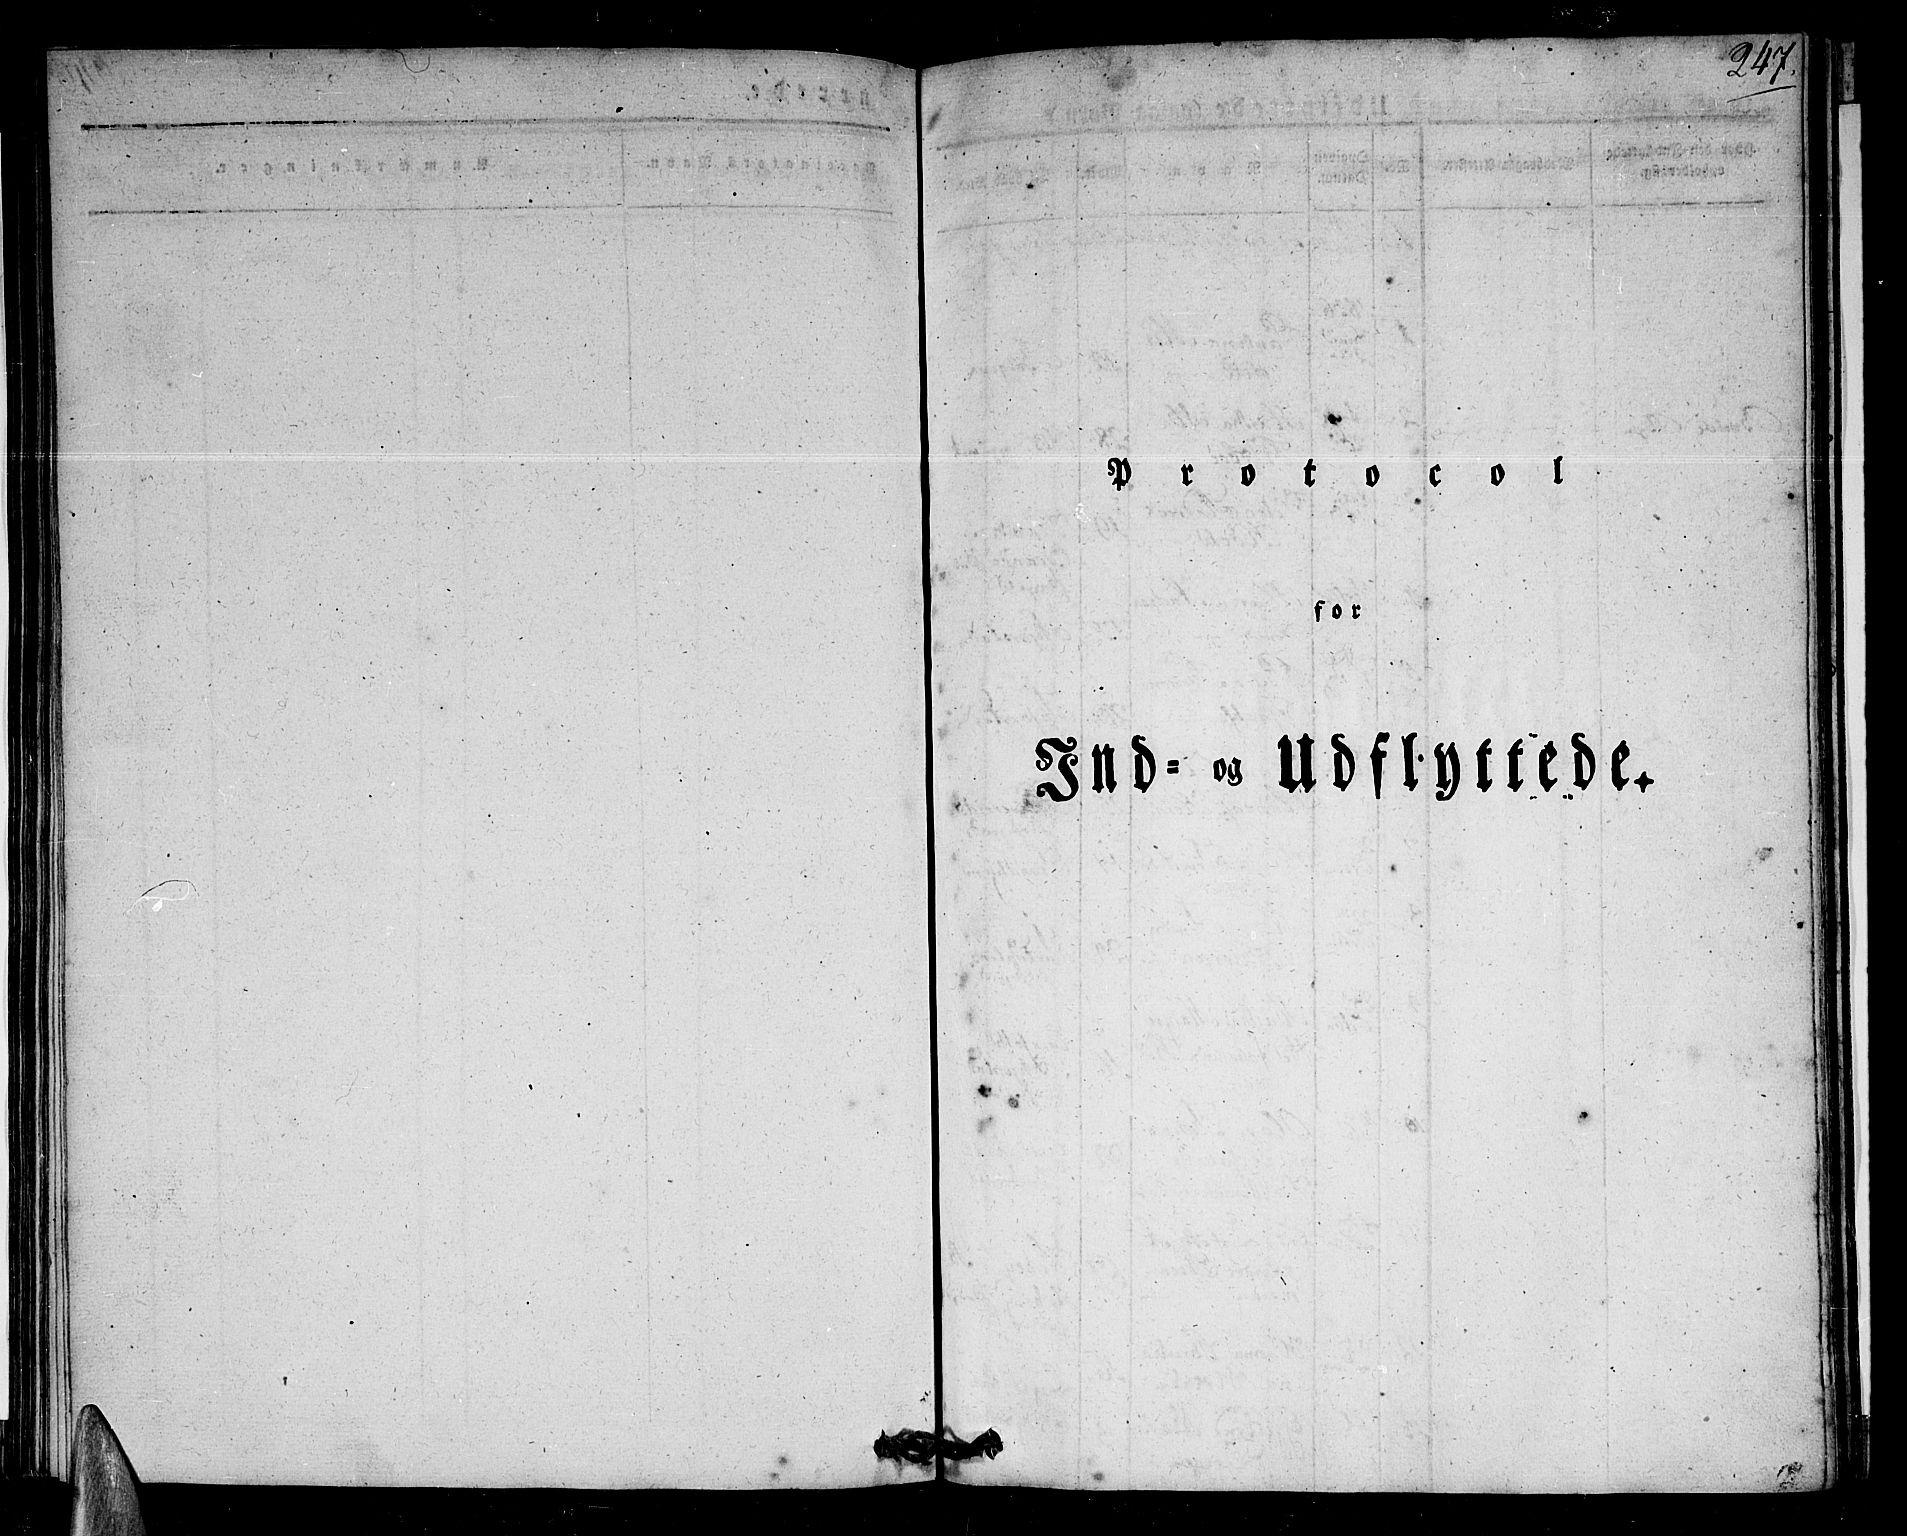 SAT, Ministerialprotokoller, klokkerbøker og fødselsregistre - Nordland, 801/L0006: Ministerialbok nr. 801A06, 1834-1845, s. 247